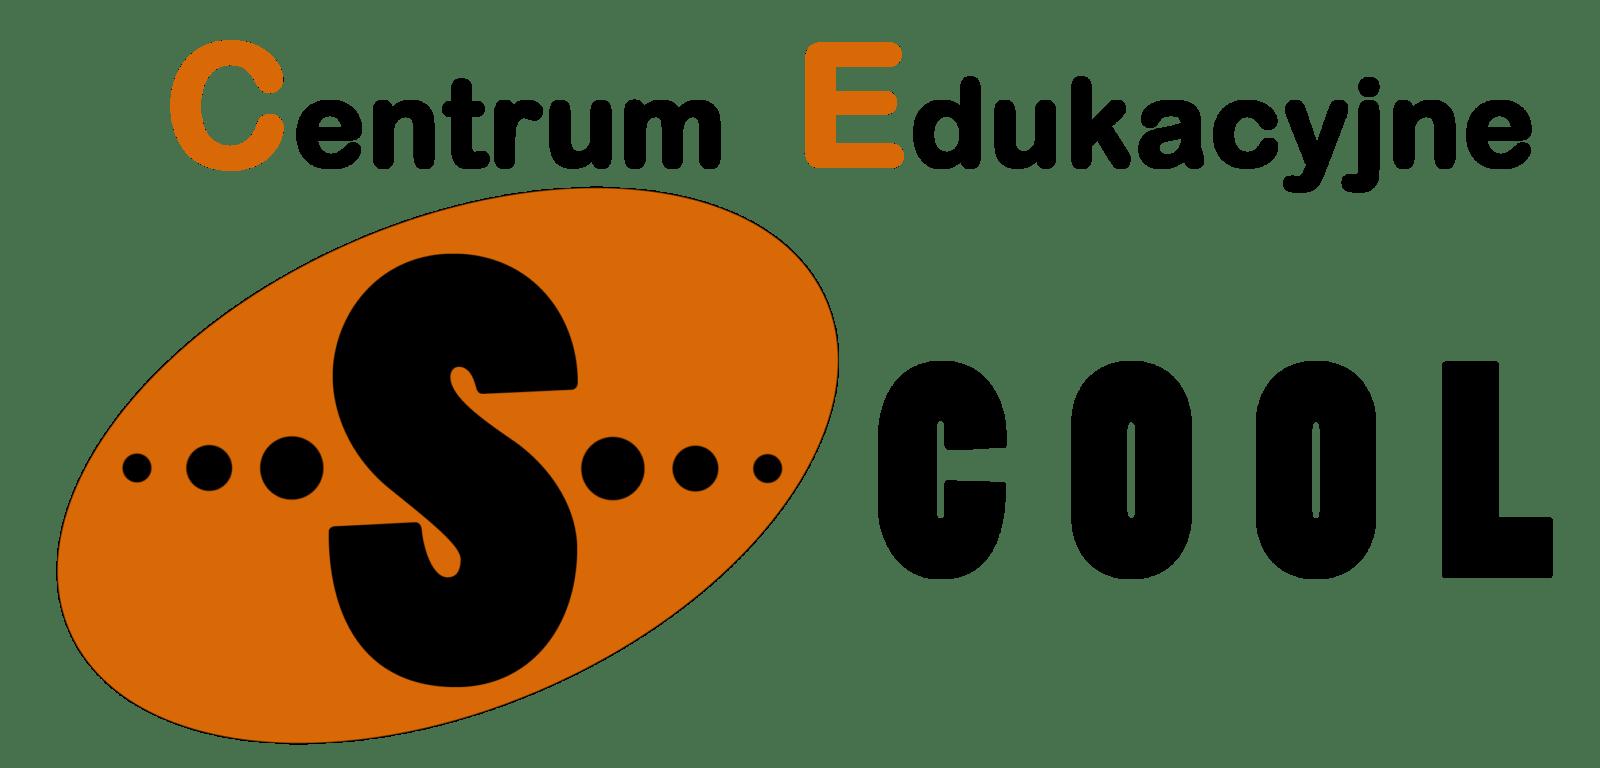 Centrum Edukacyjne Scool